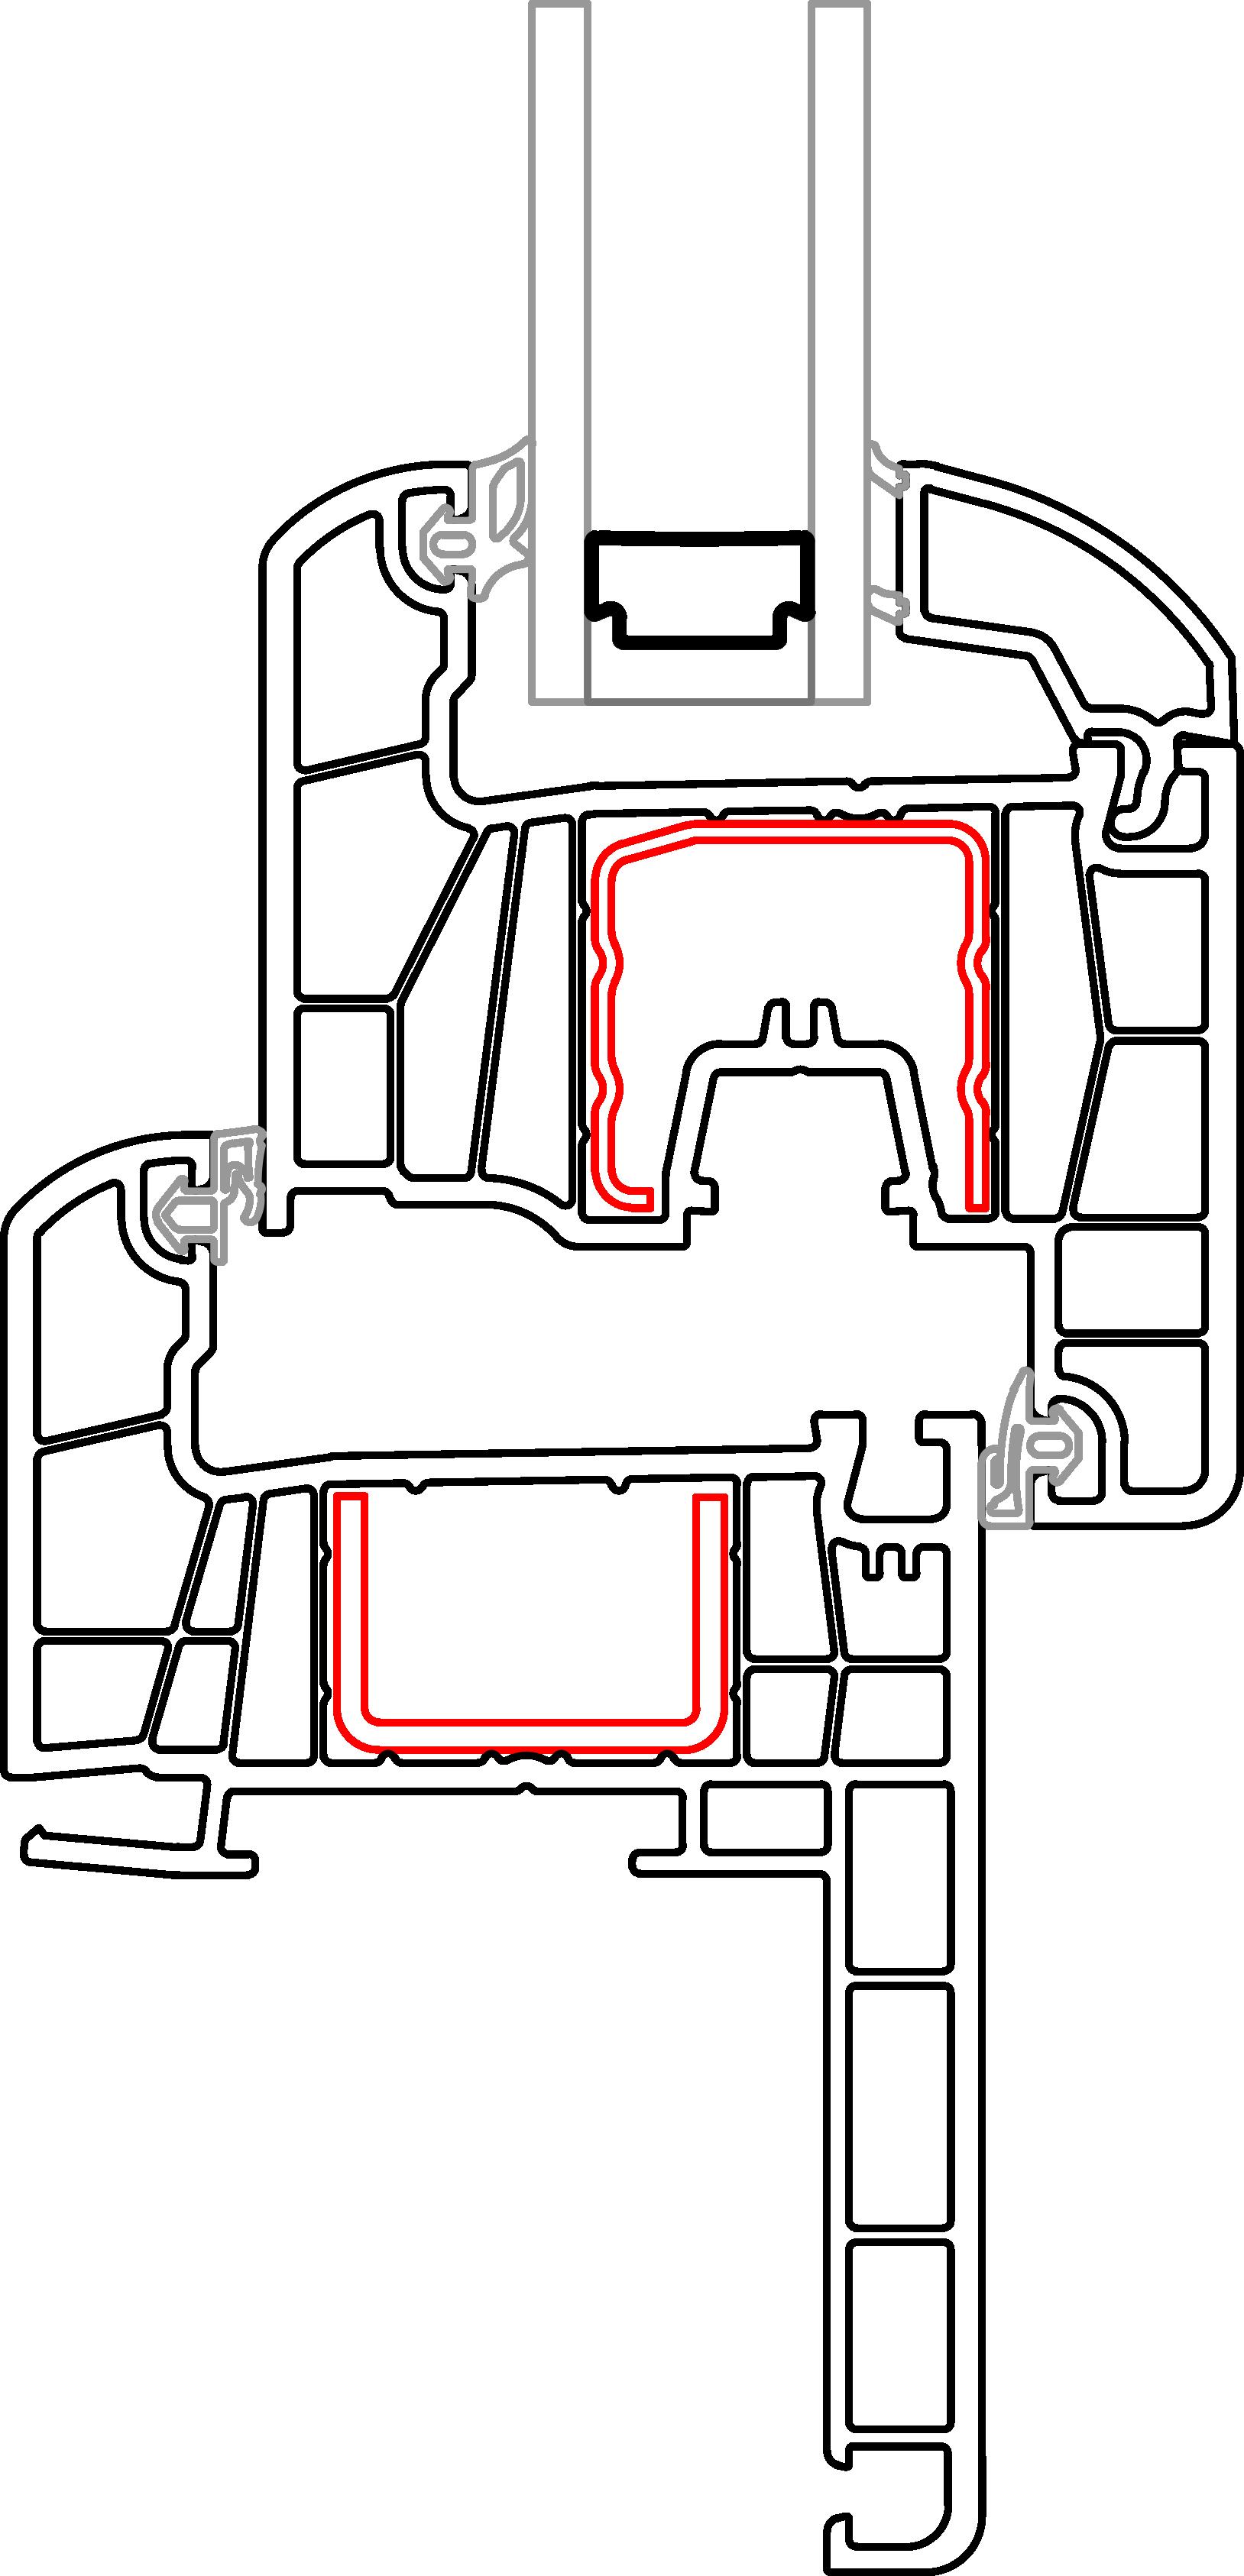 Renova_system_2